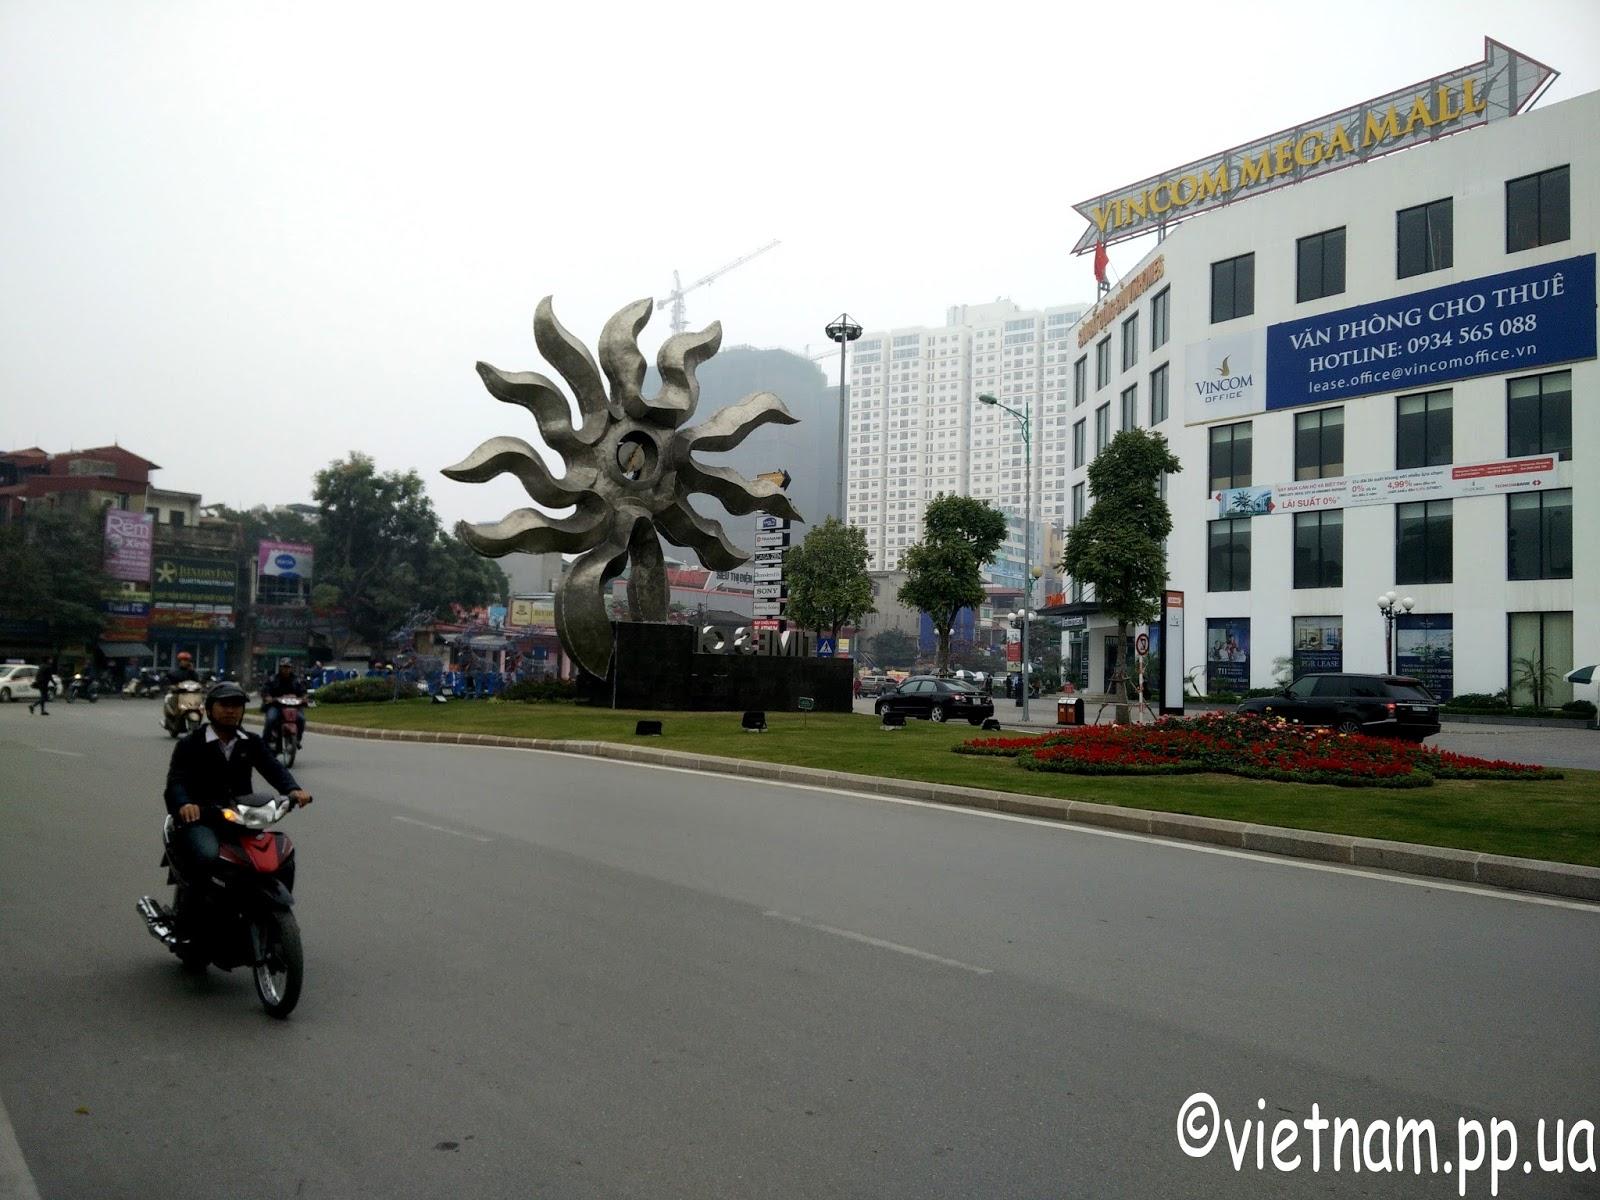 Ханой Вьетнам фото